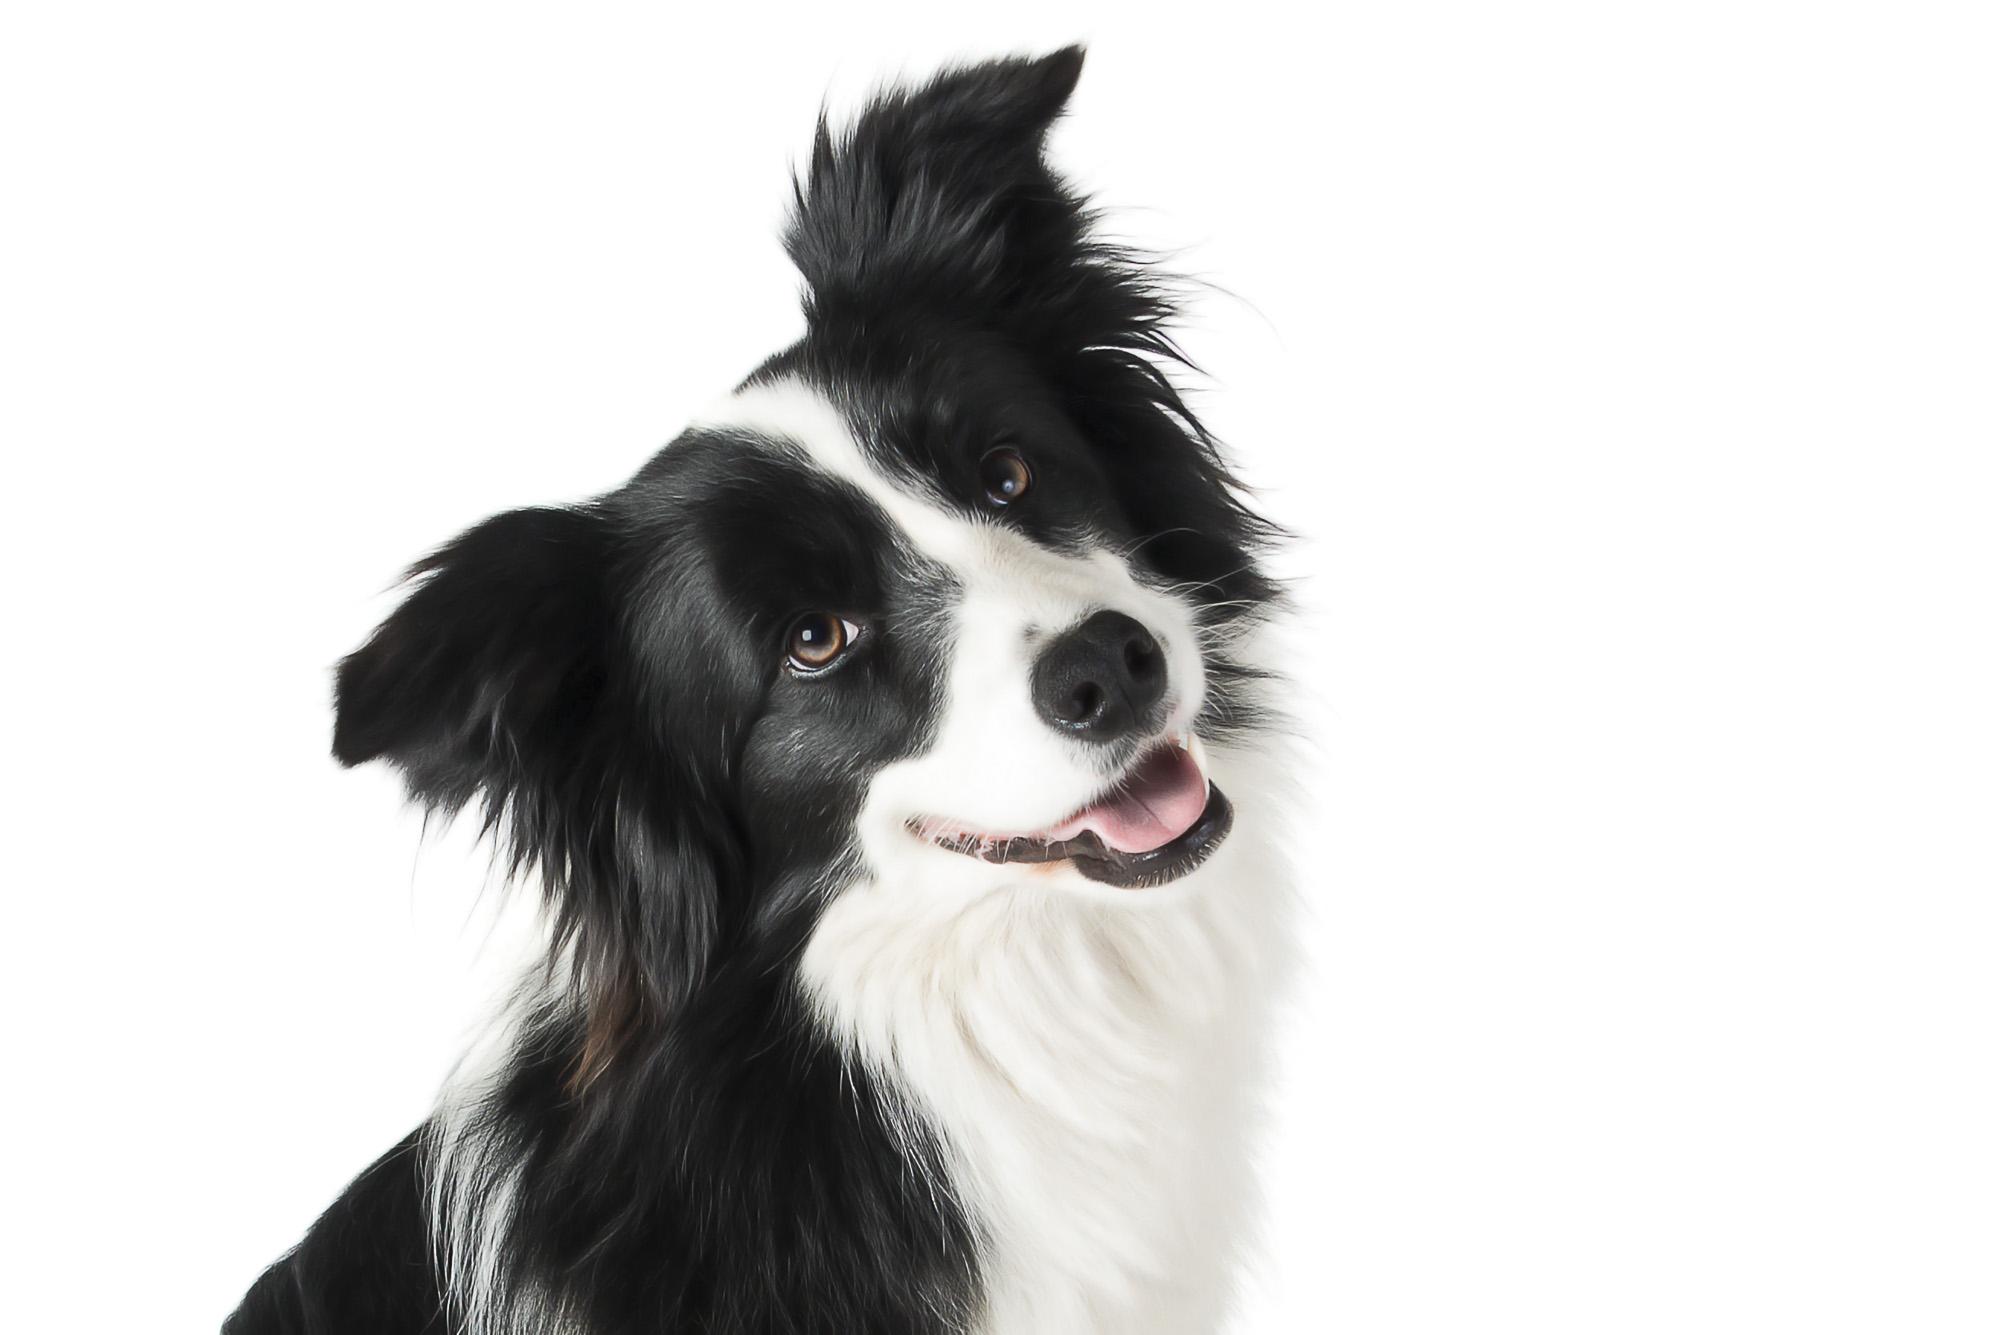 LupinBay-Border-Collie-Dog-Photography-0159-5362.jpg